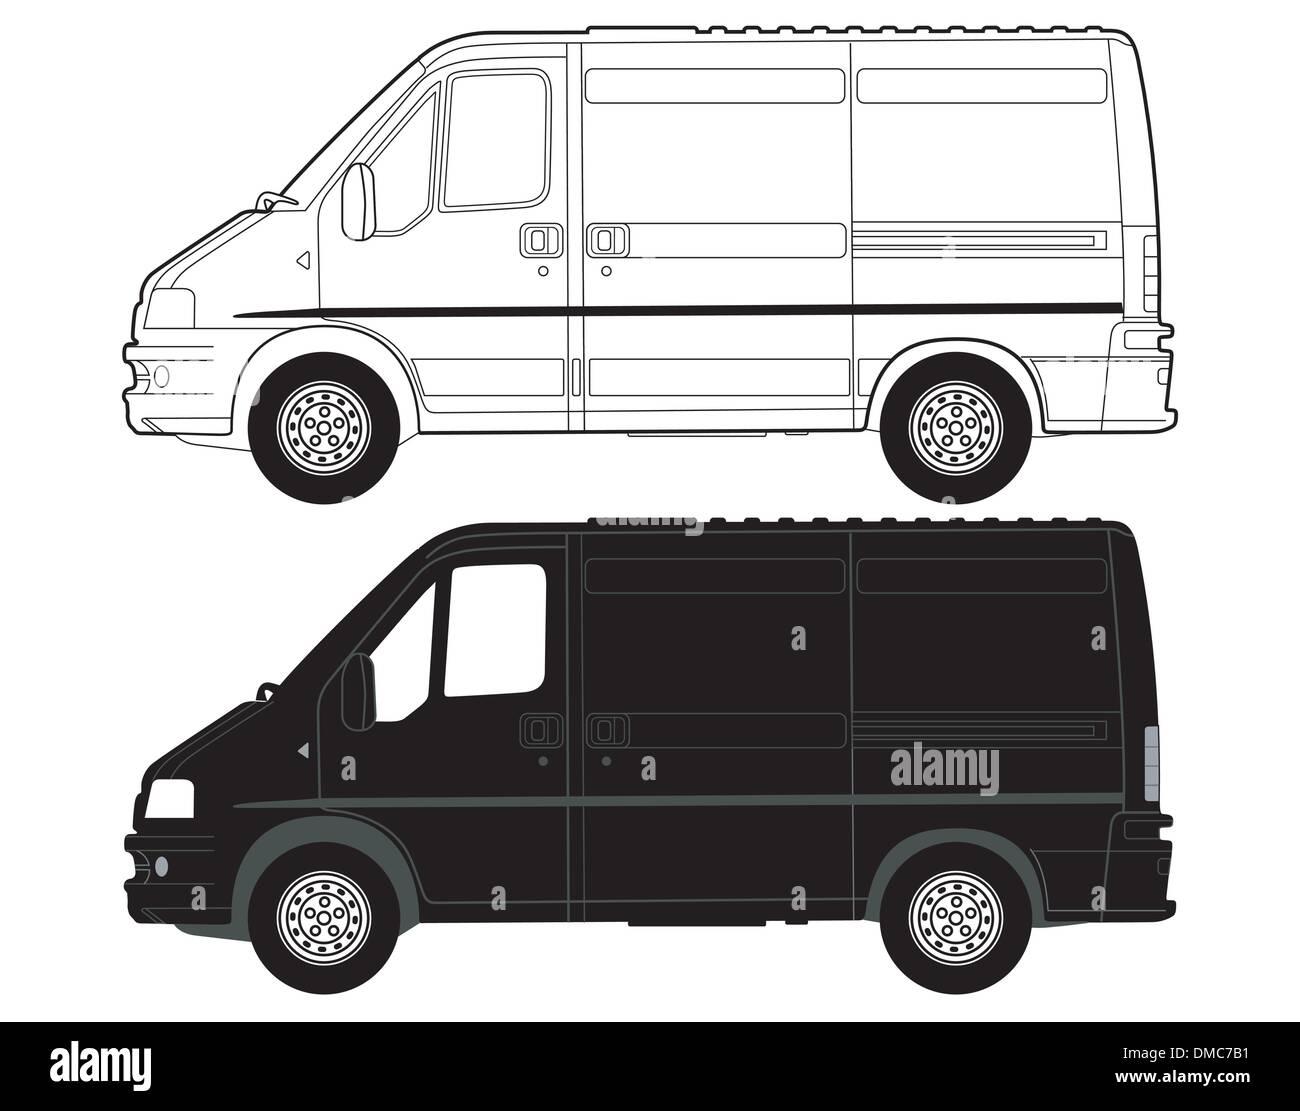 Transportation Van - Stock Image